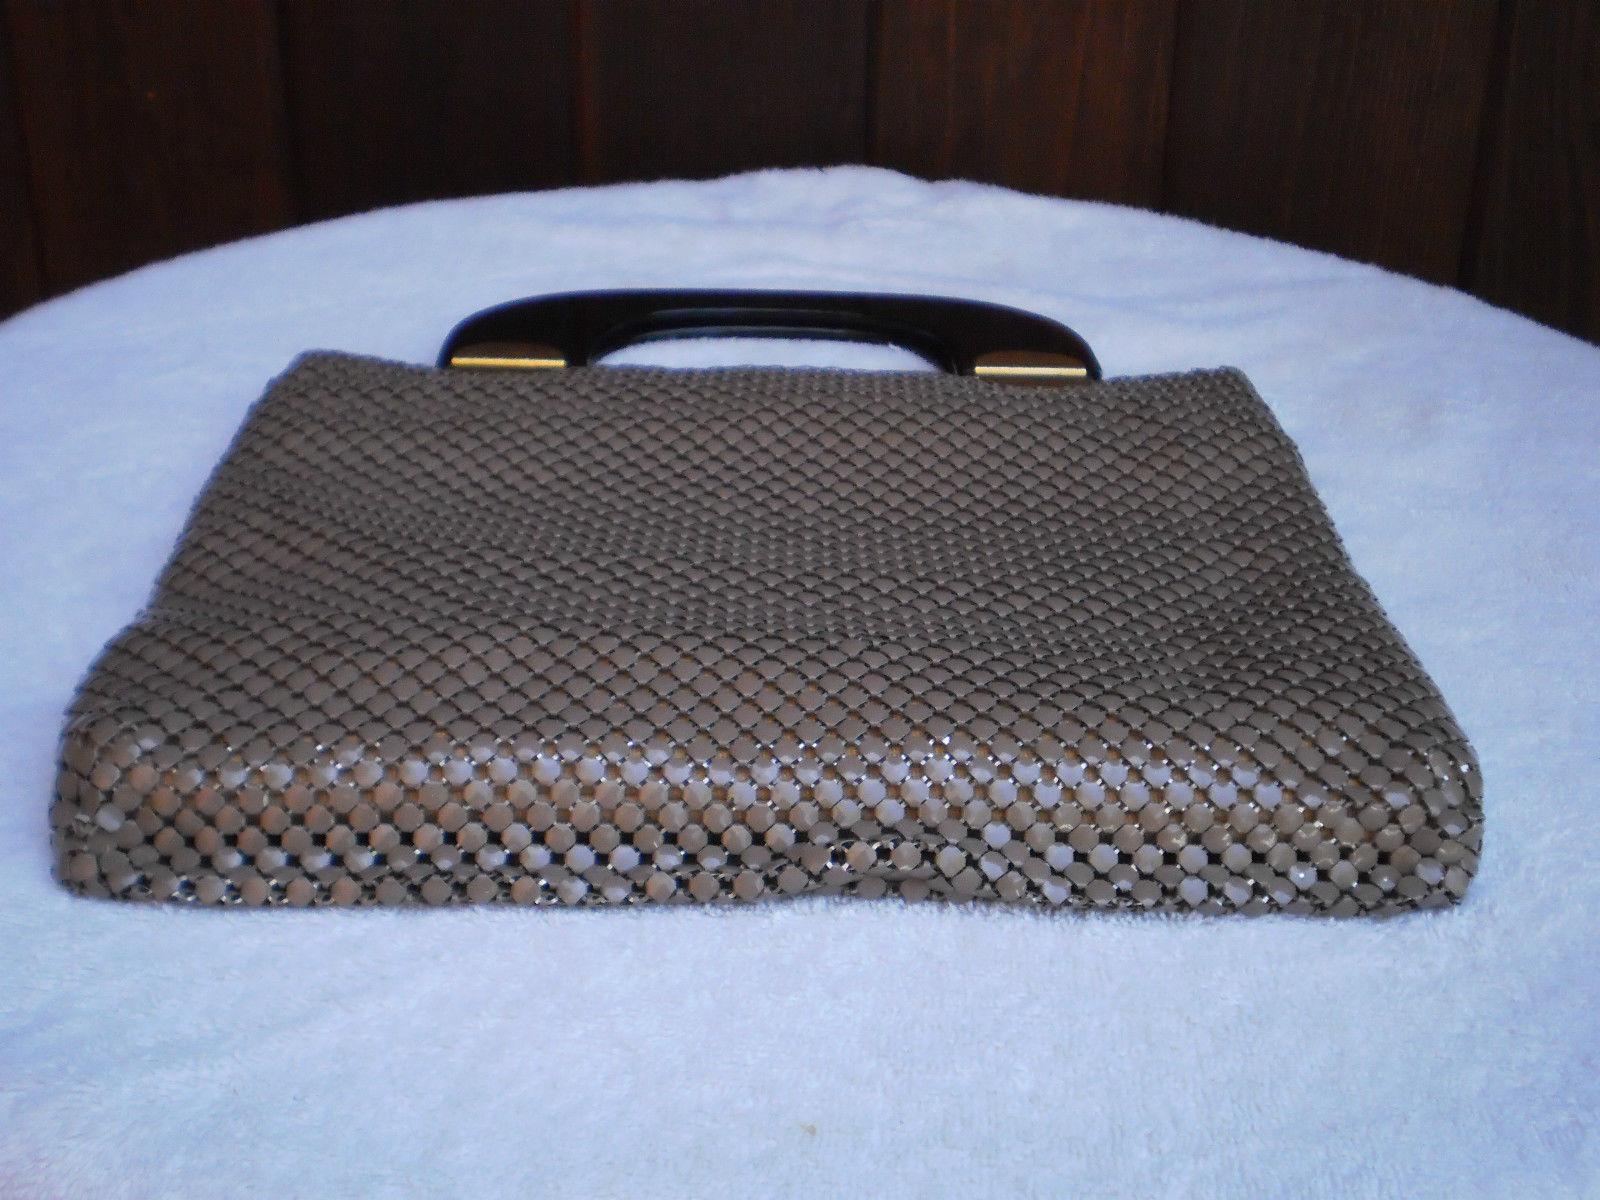 square and chic metal handbag by la regale handbags purses. Black Bedroom Furniture Sets. Home Design Ideas